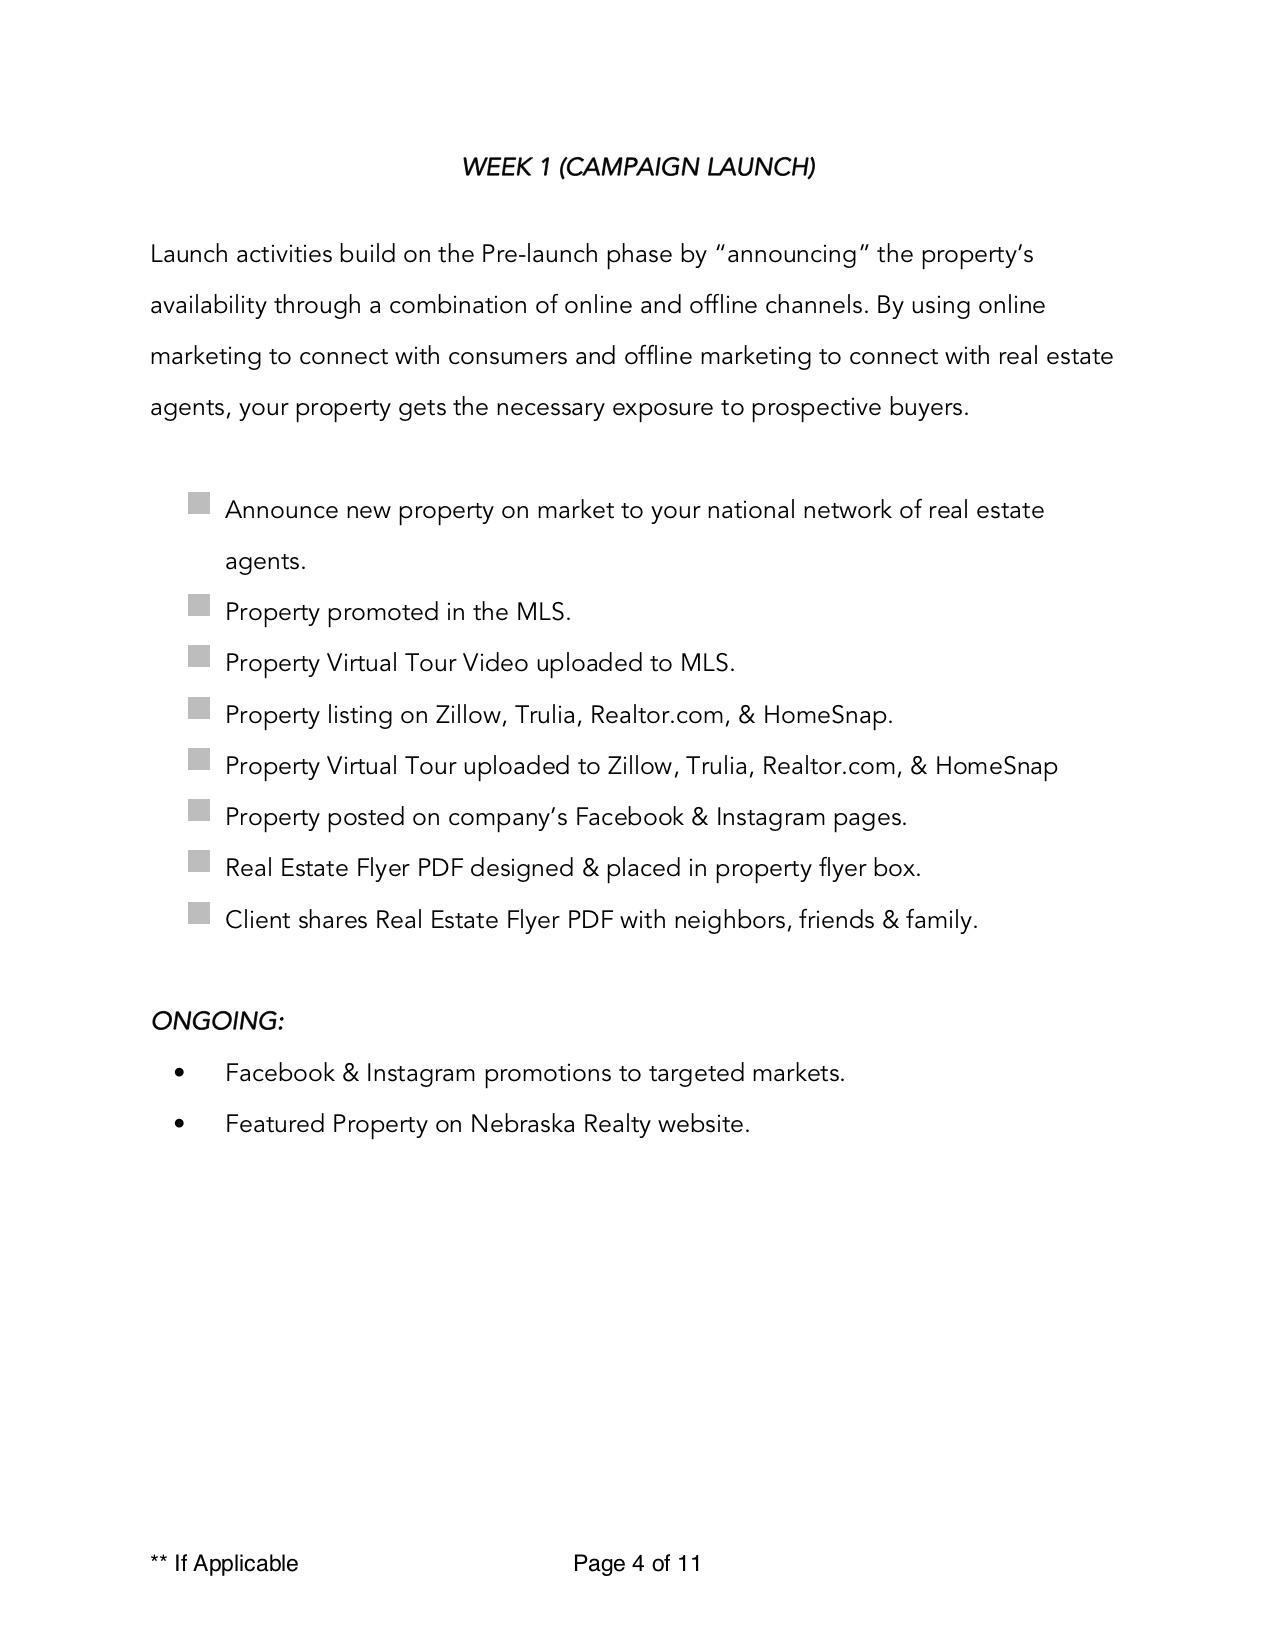 8 Week Marketing Plan4.jpg